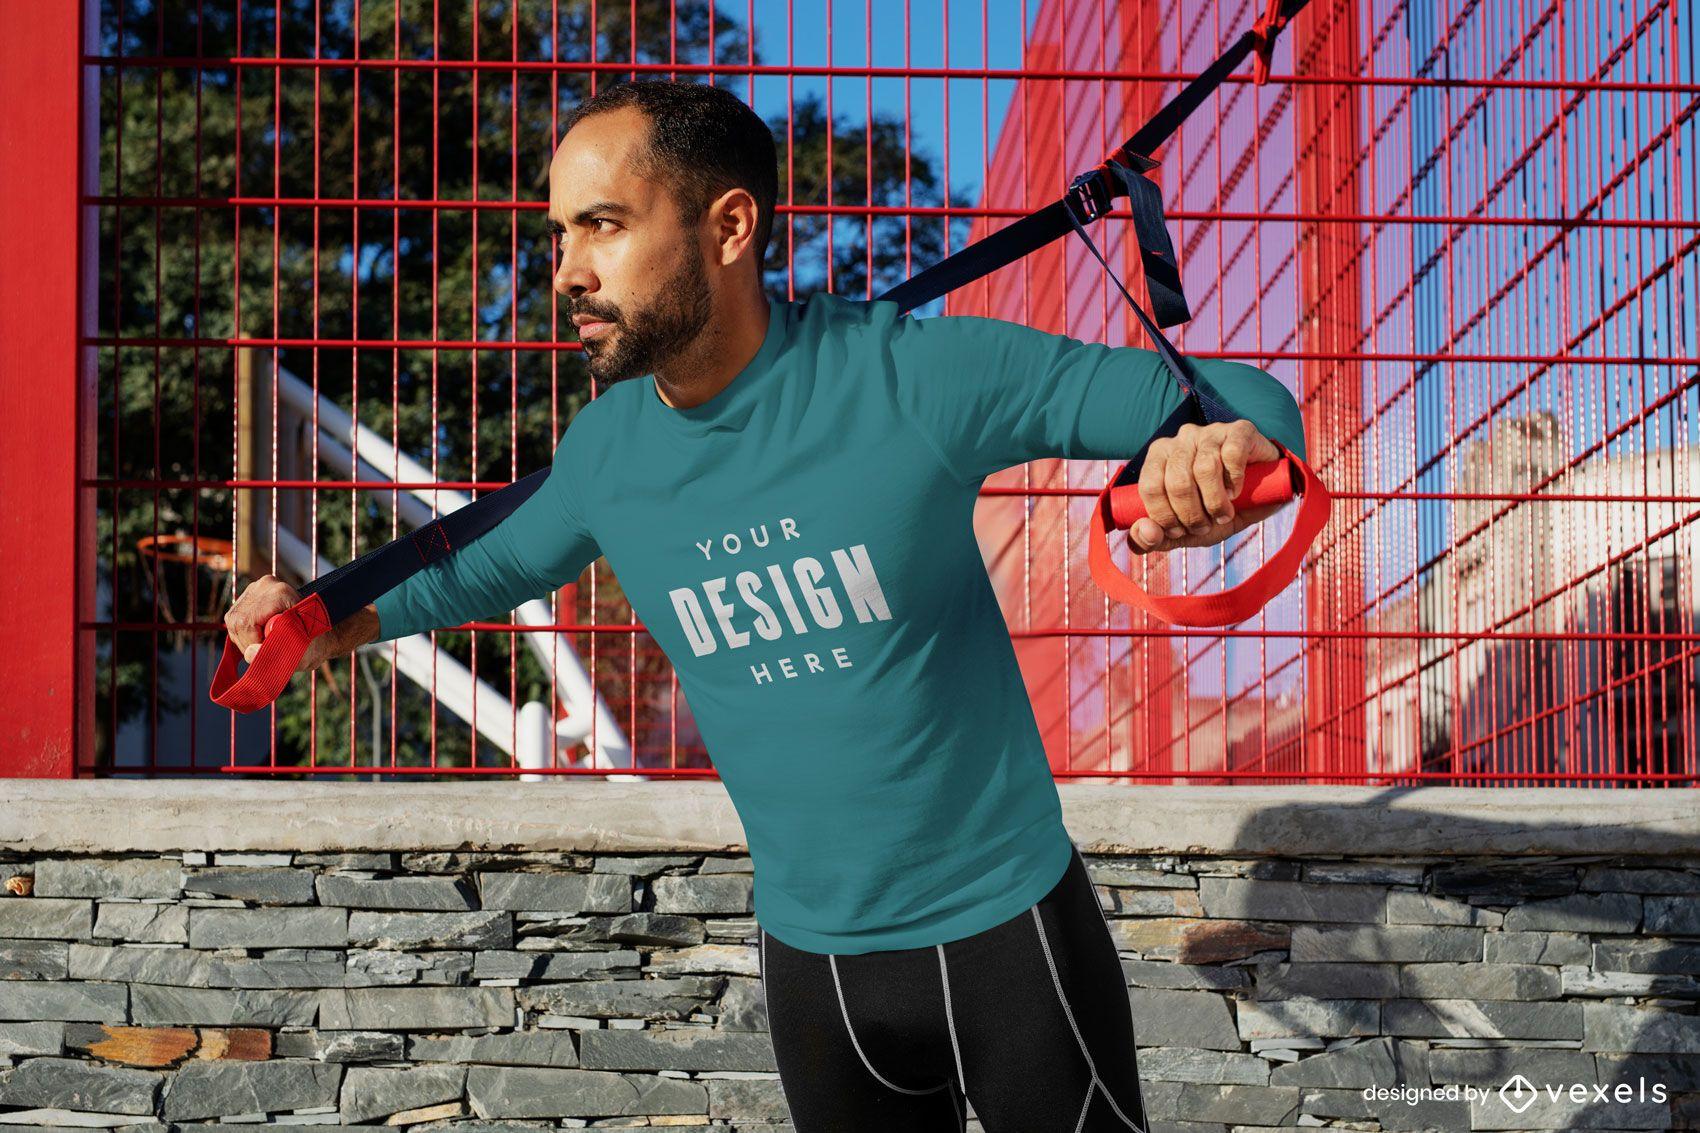 Workout model t-shirt mockup